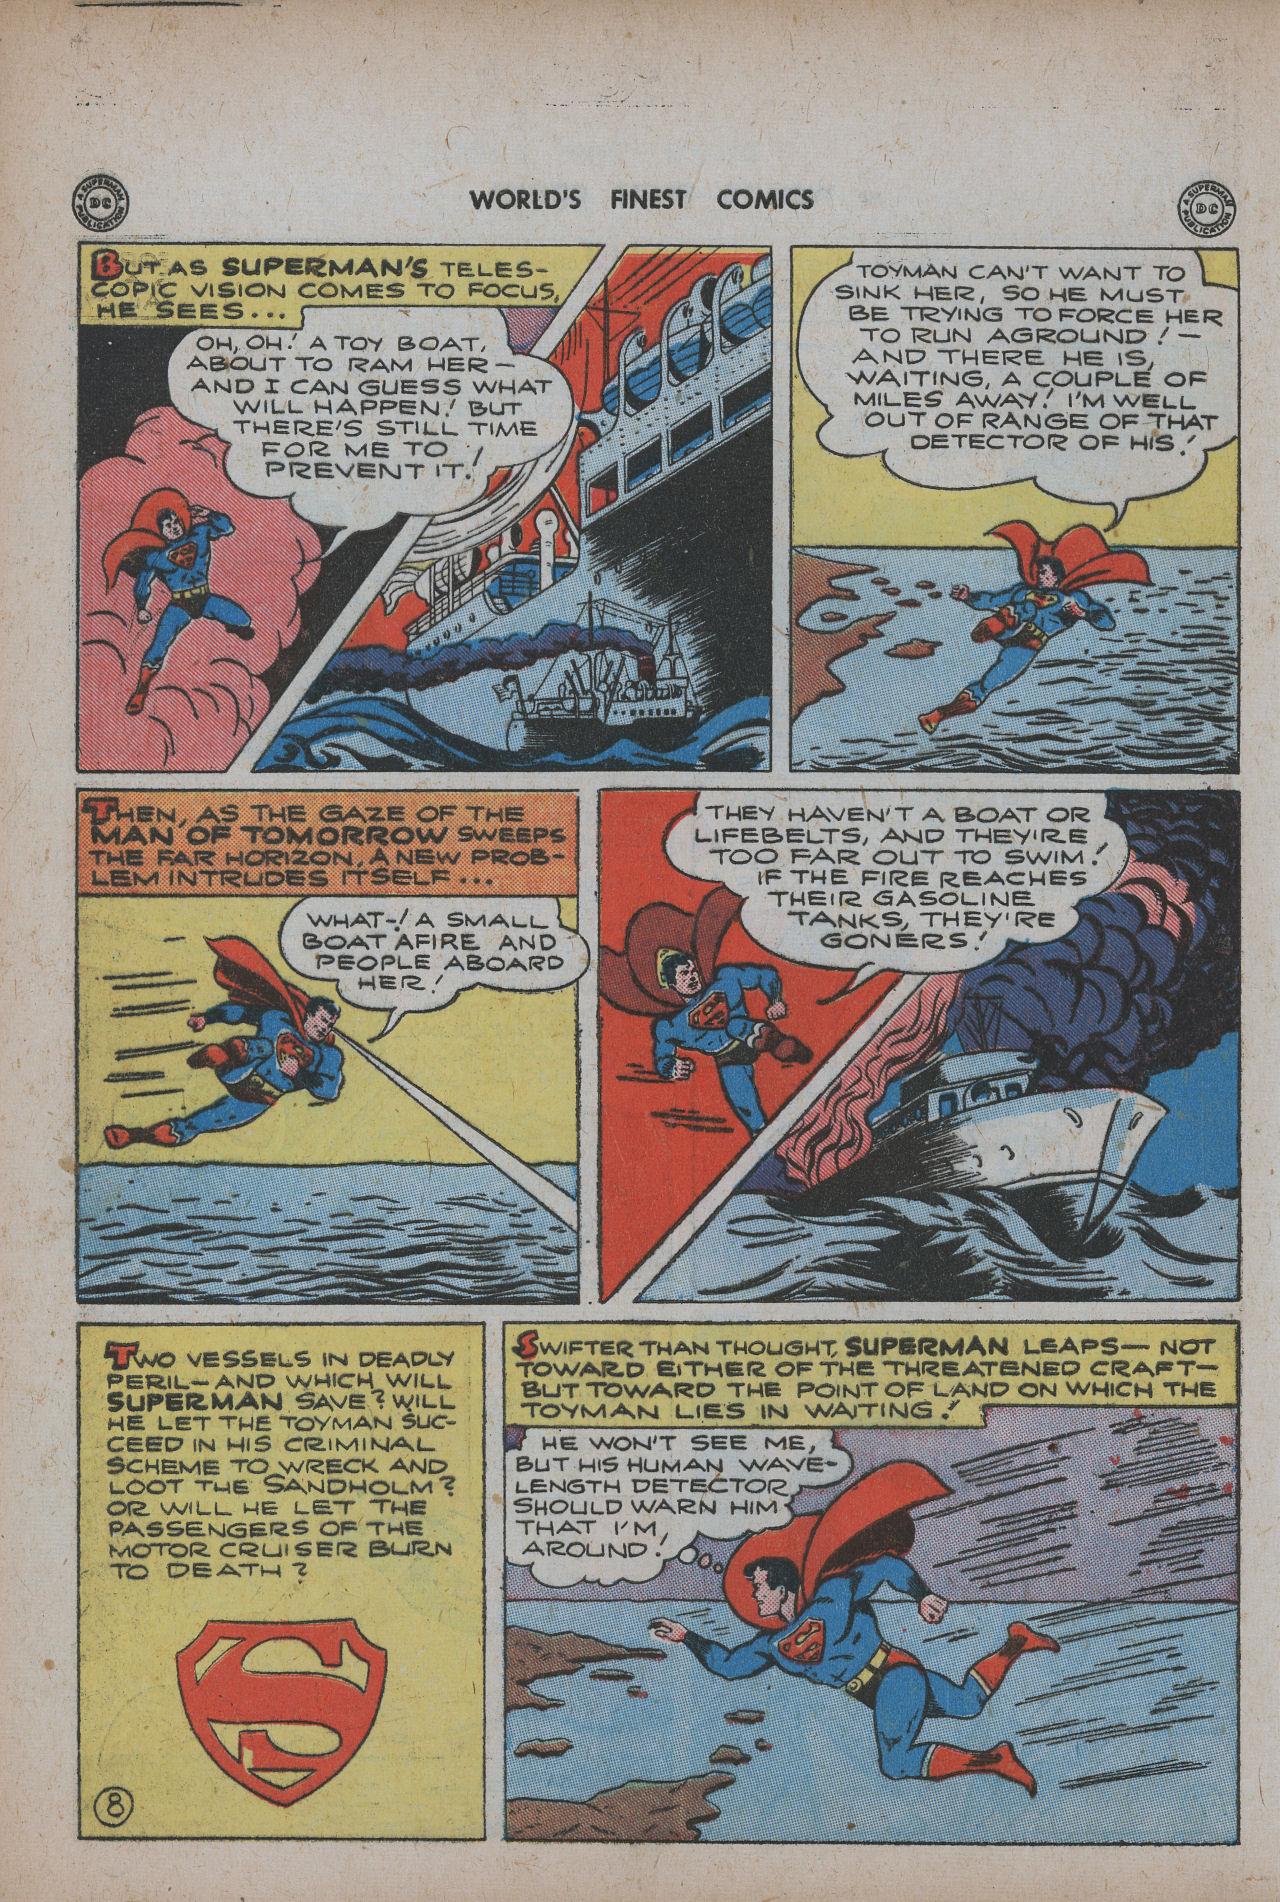 Read online World's Finest Comics comic -  Issue #20 - 10